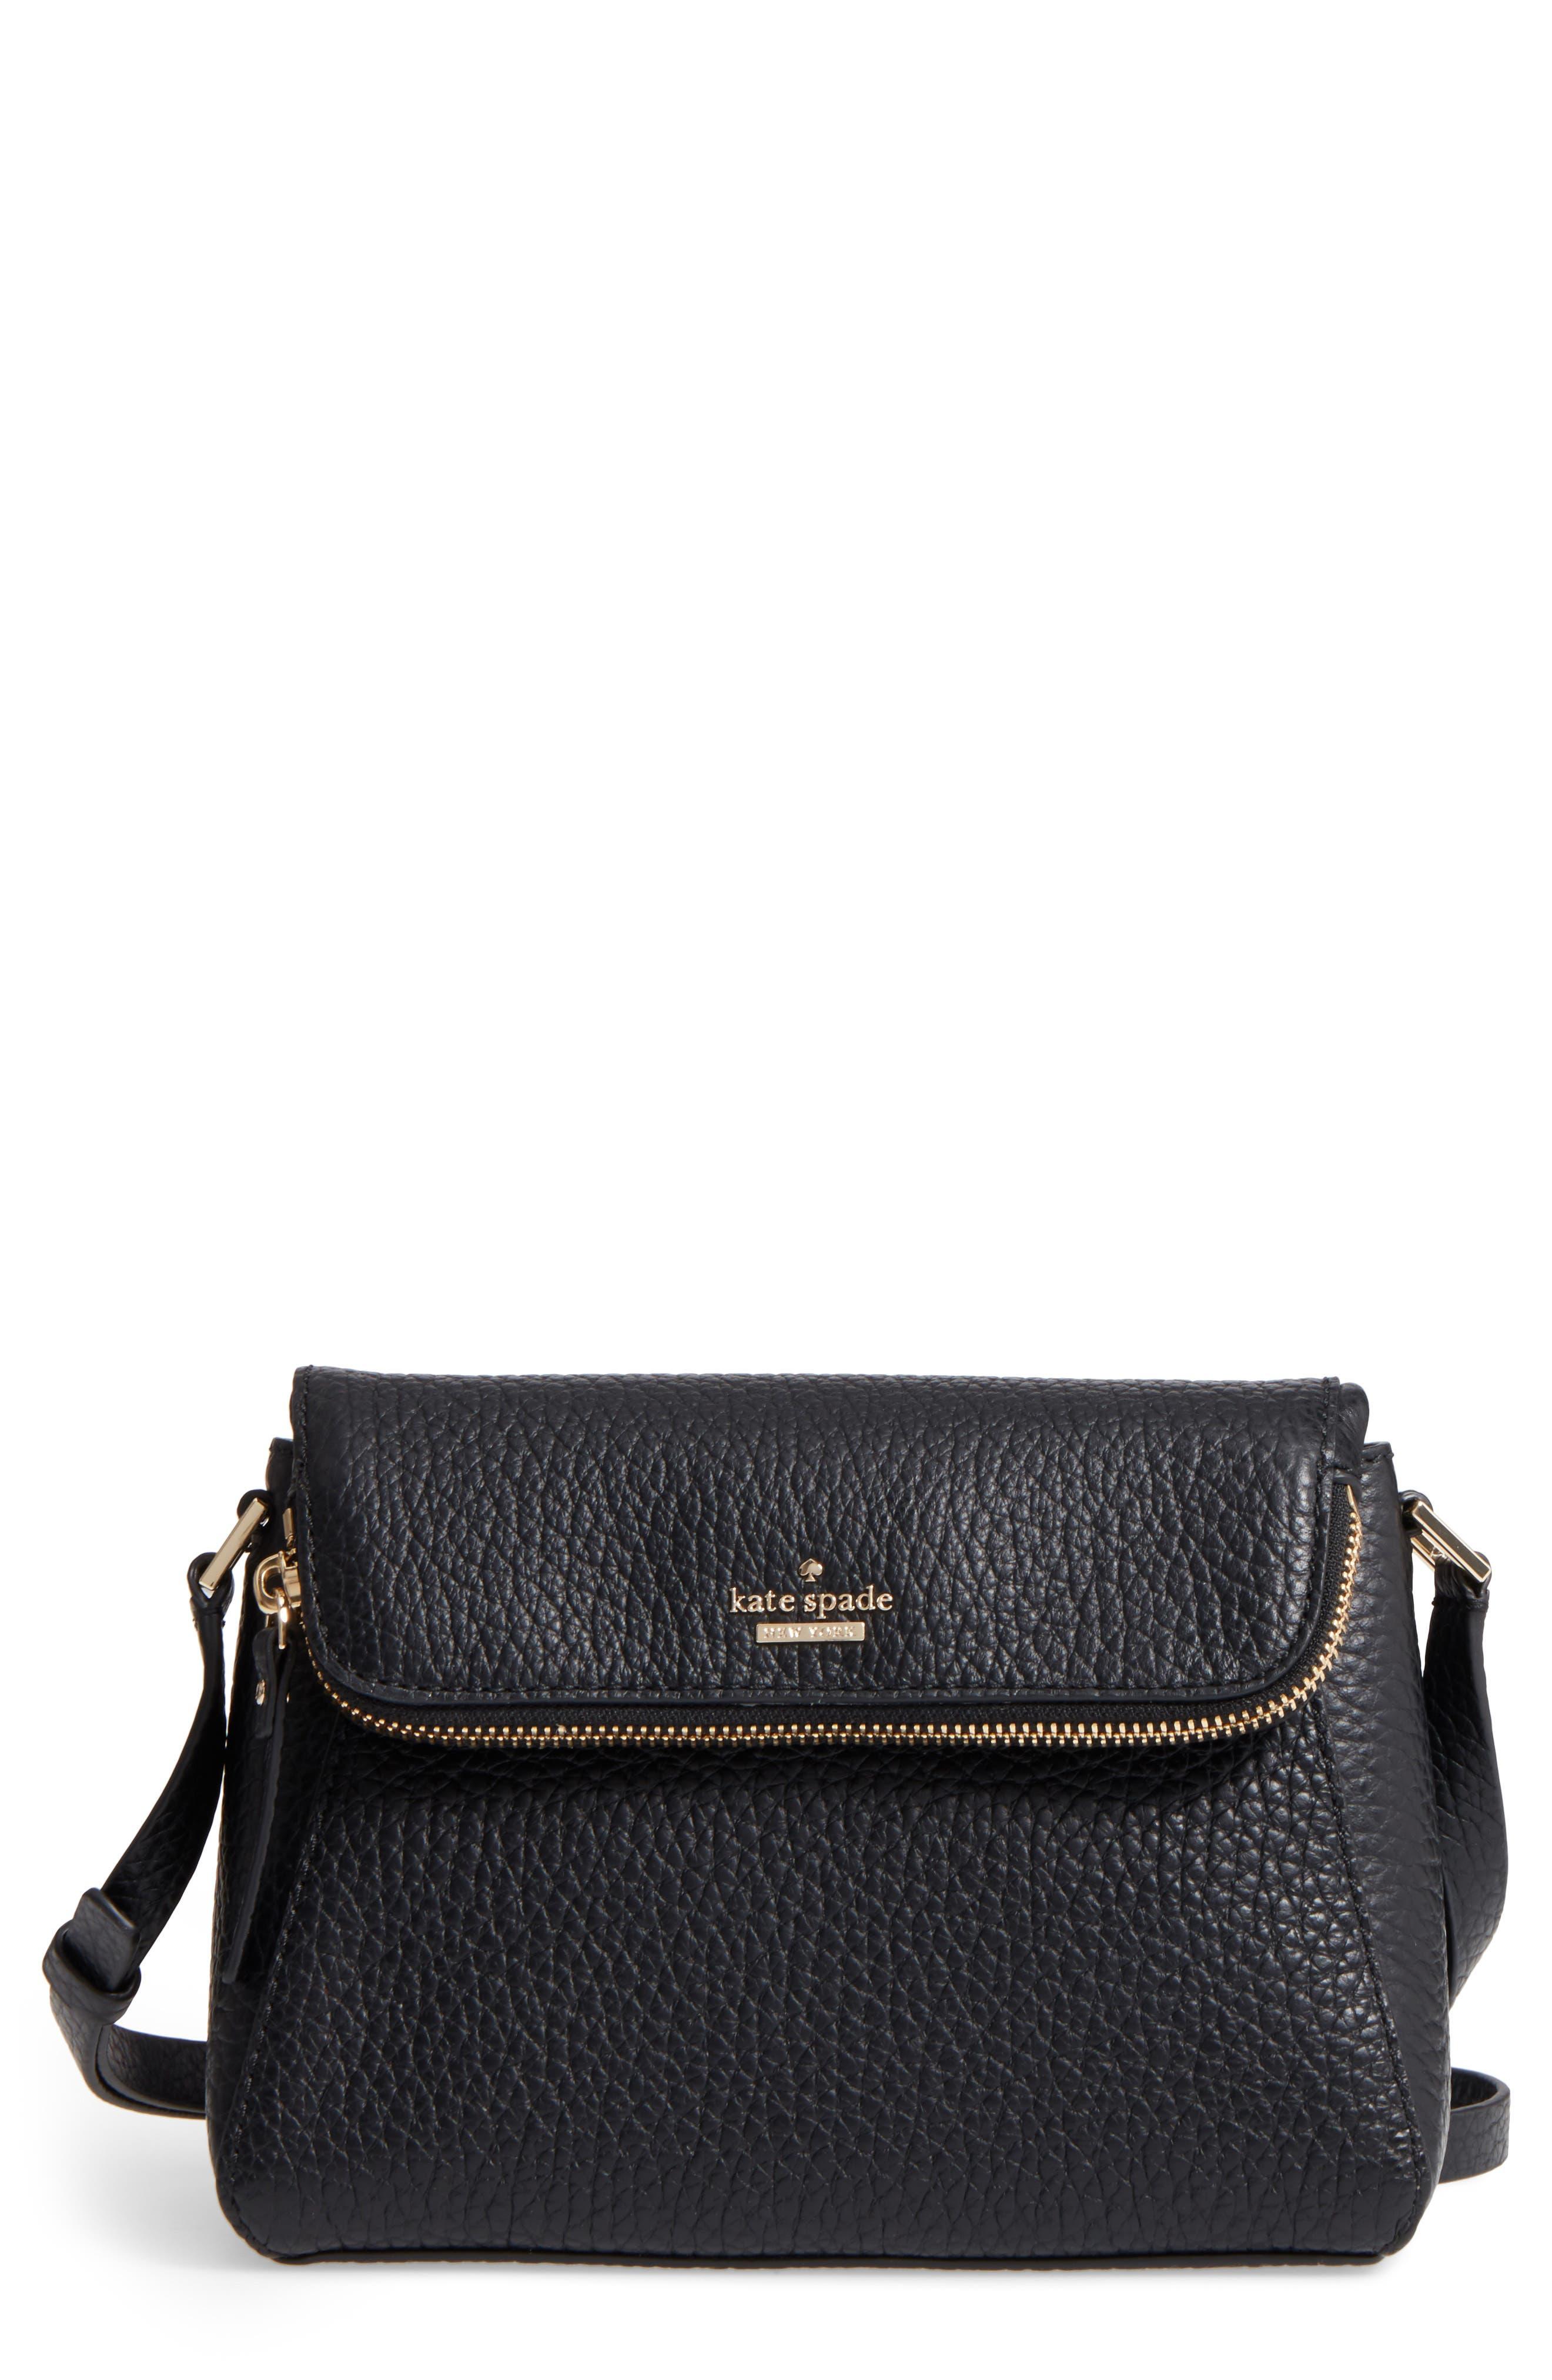 Main Image - kate spade new york carter street - berrin leather crossbody bag